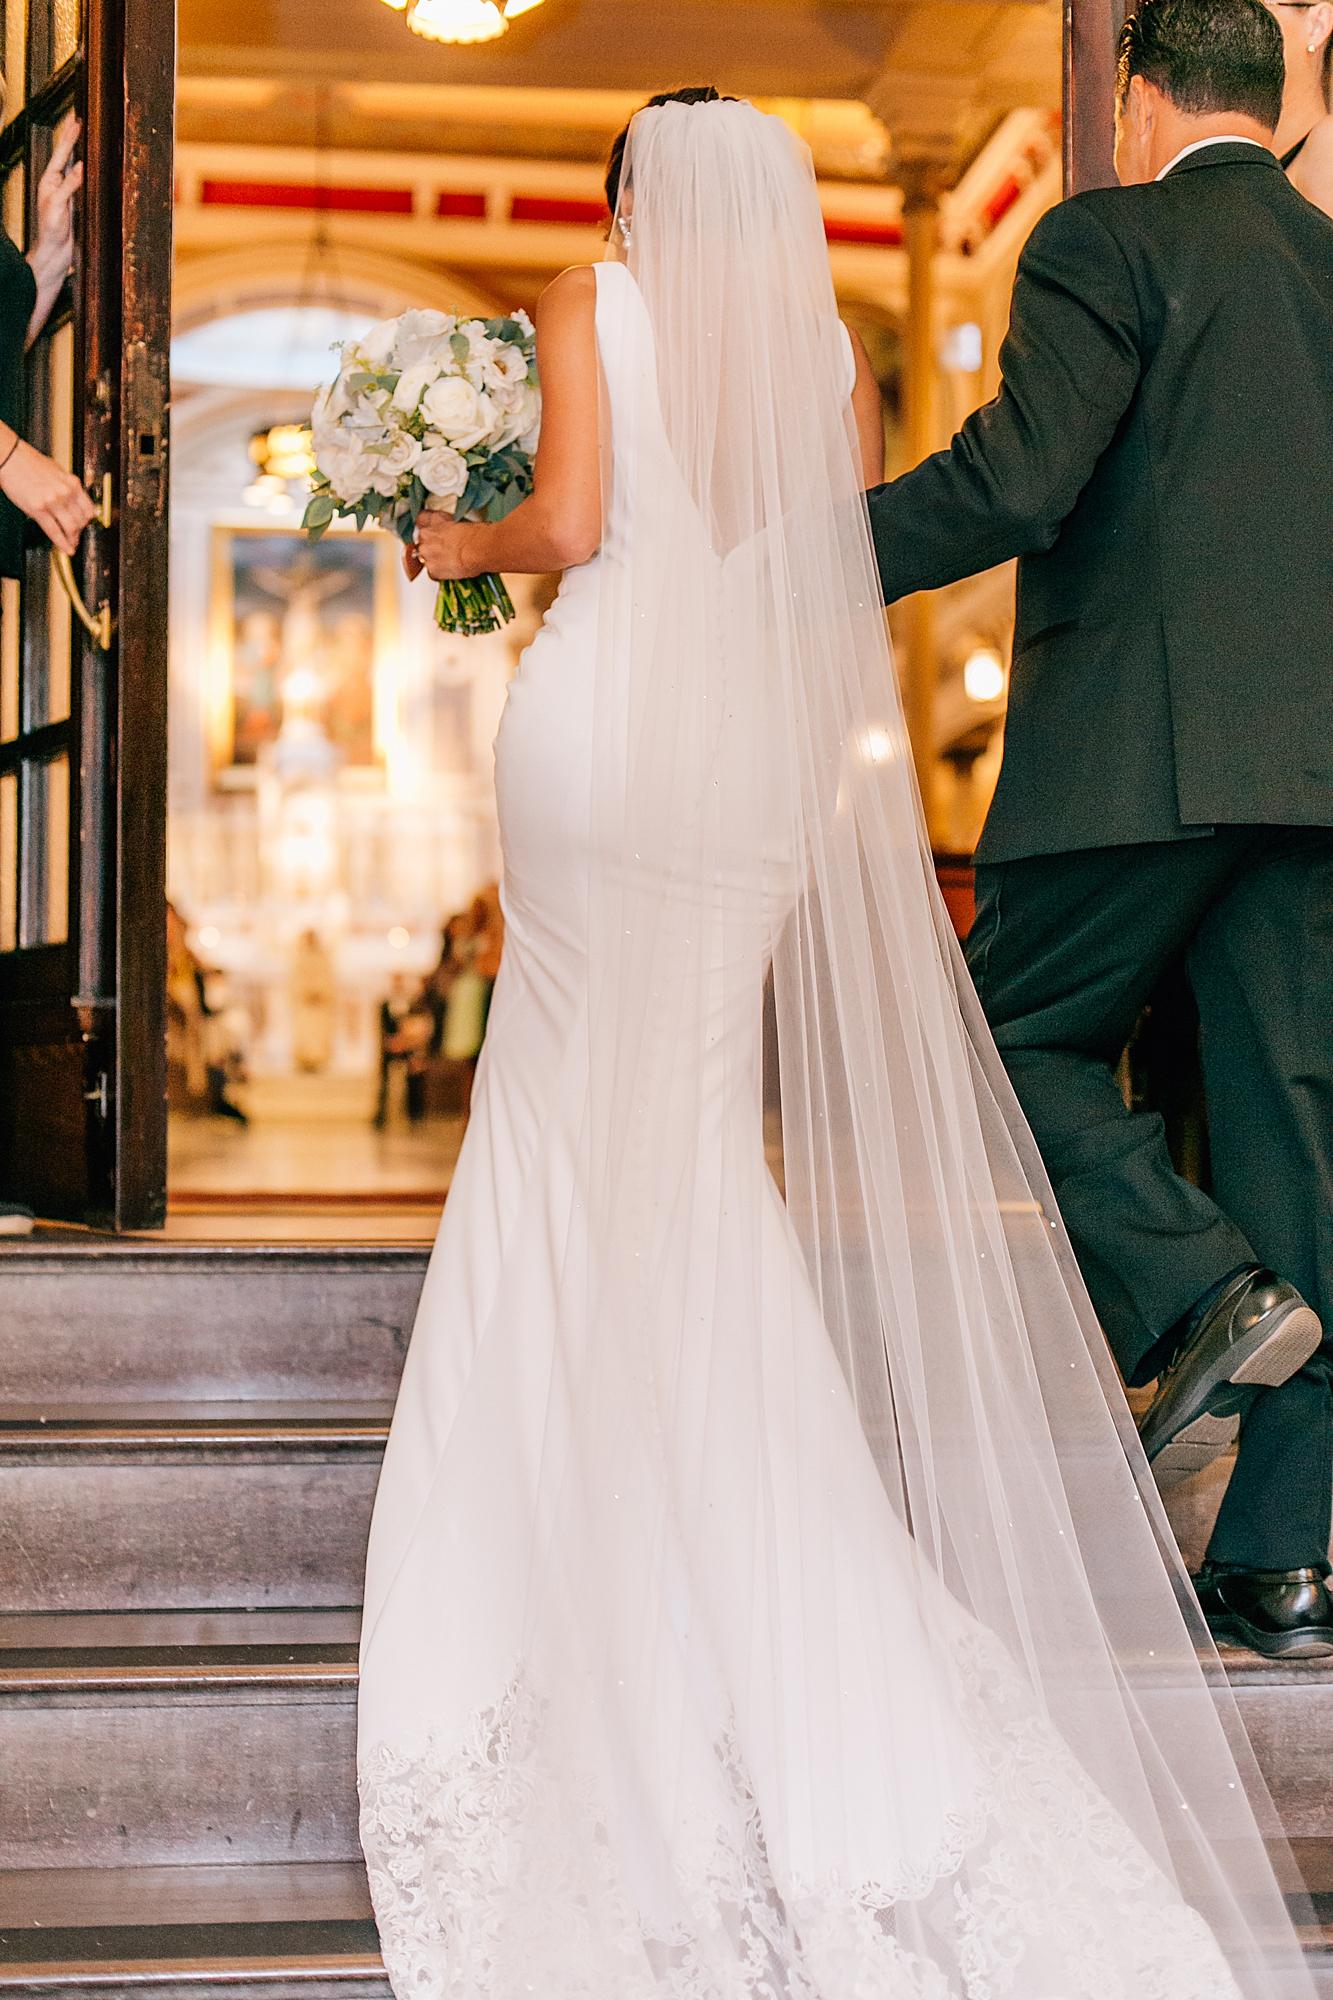 Cescaphe Philadelphia Film Wedding Photography by Magdalena Studios 16